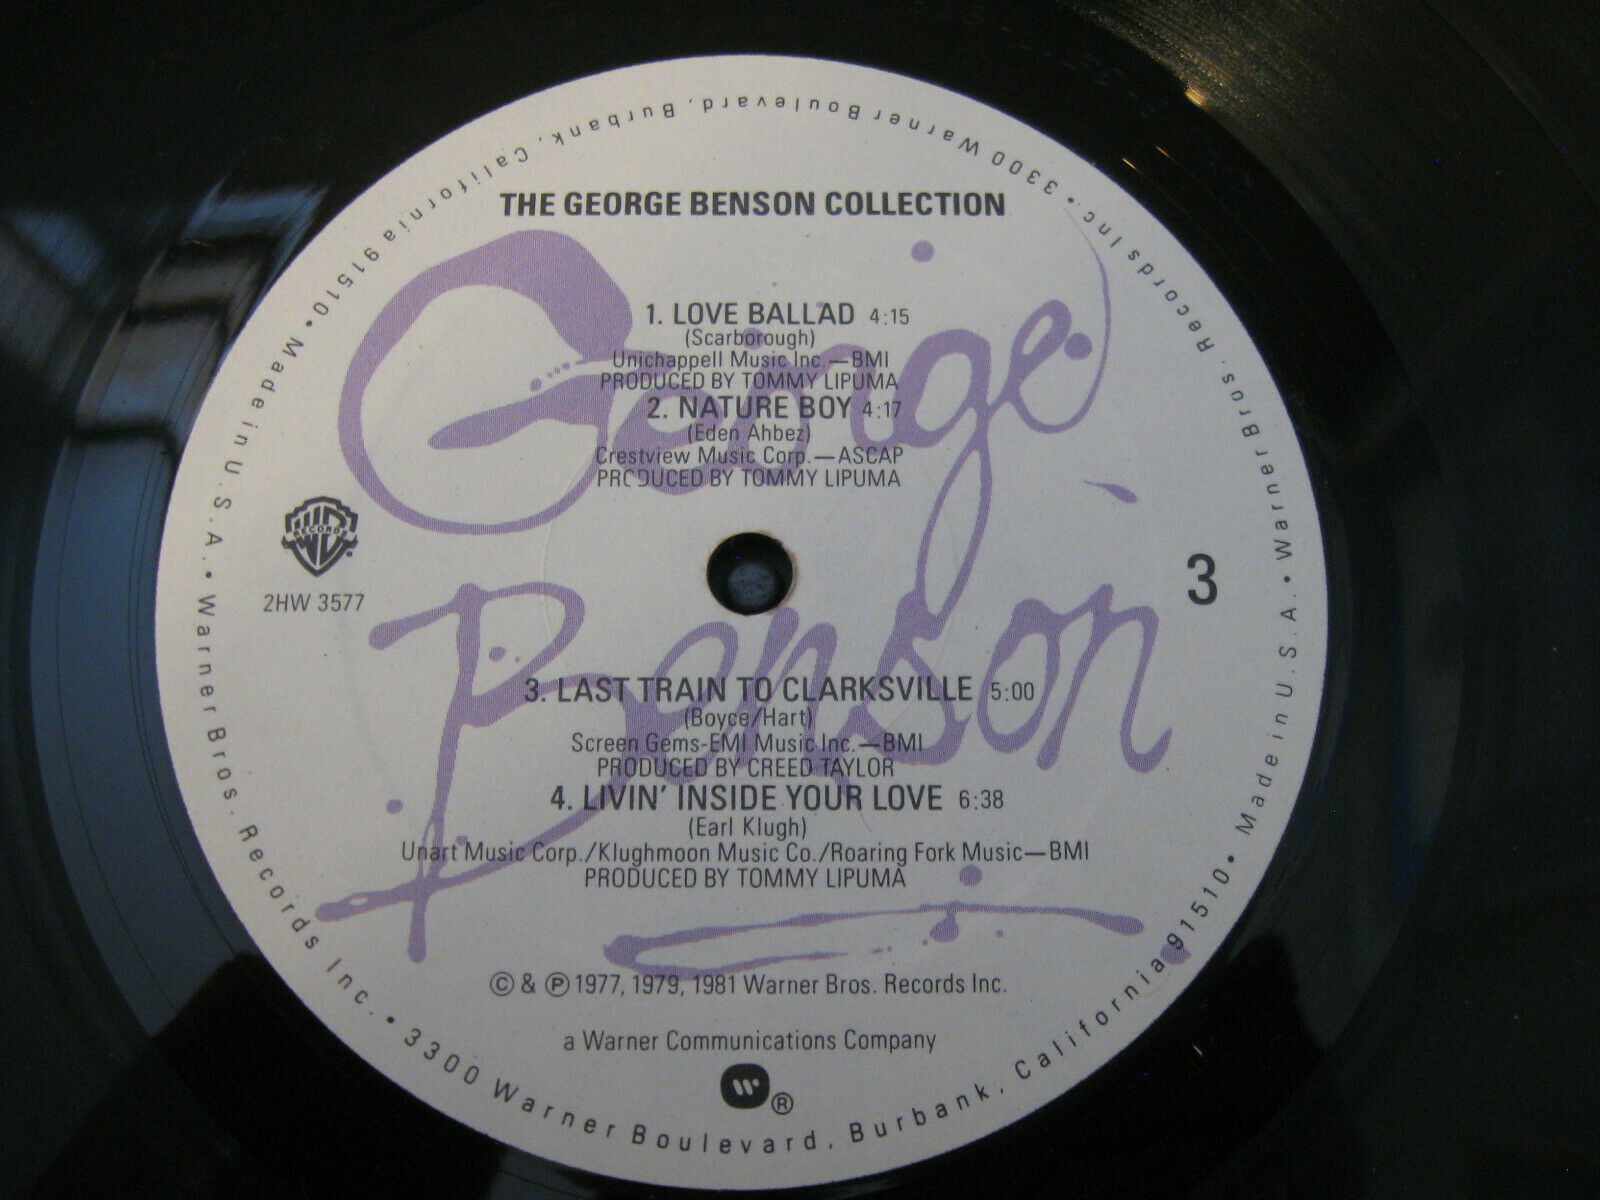 The George Benson Collection Warner Bros 2HW 3577 Stereo Vinyl Record LP Album image 9